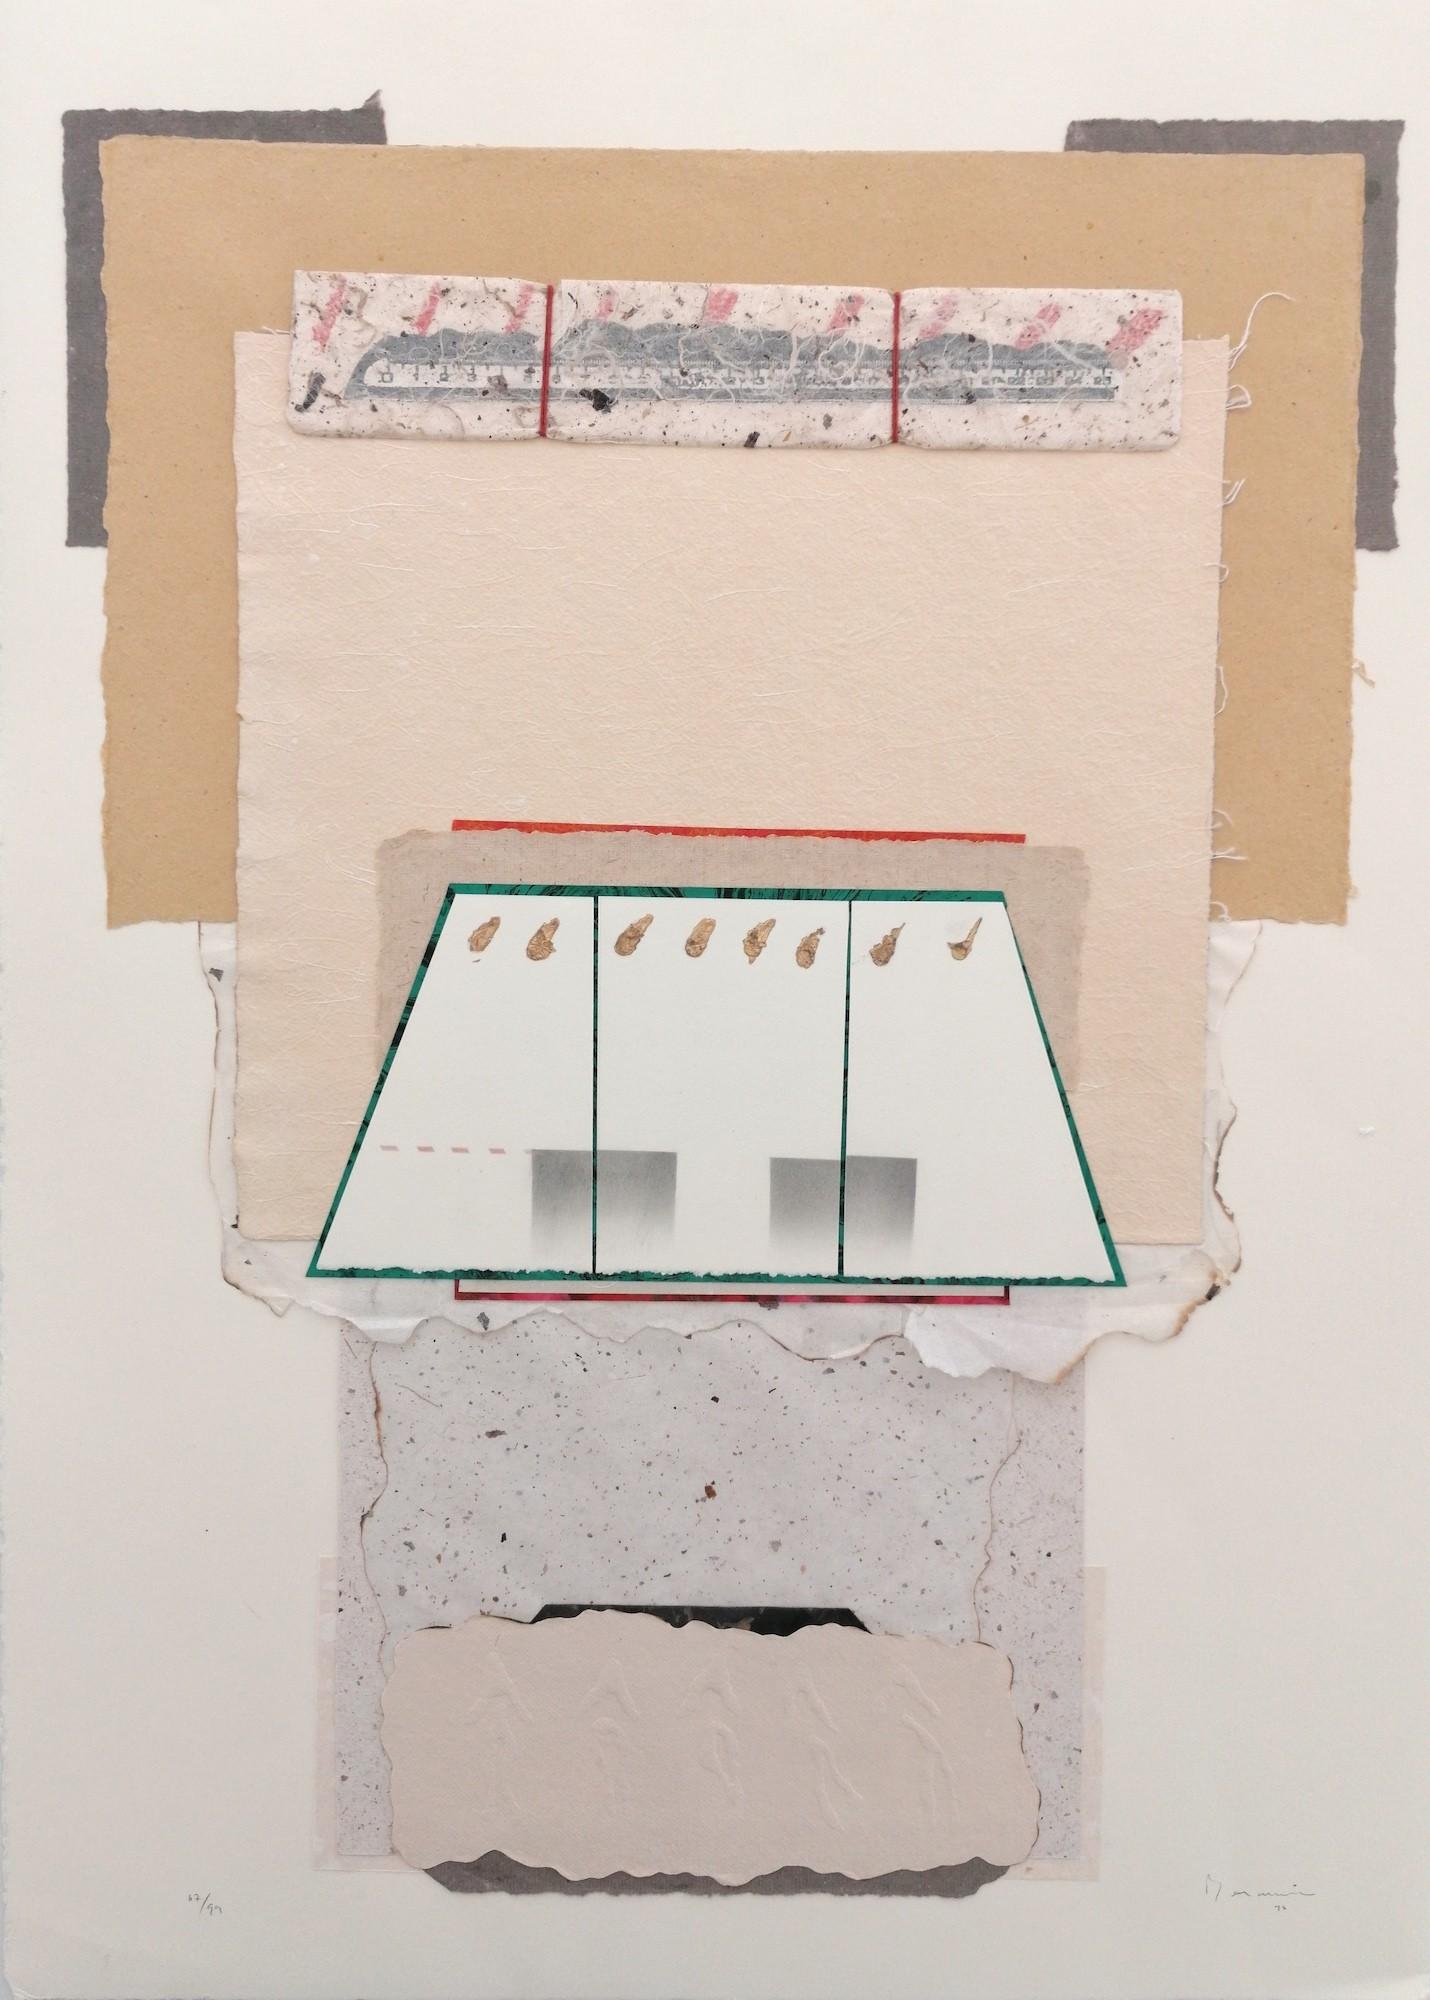 Benaim, Ricardo, Kunst, Galerie Voigt, Nürnberg